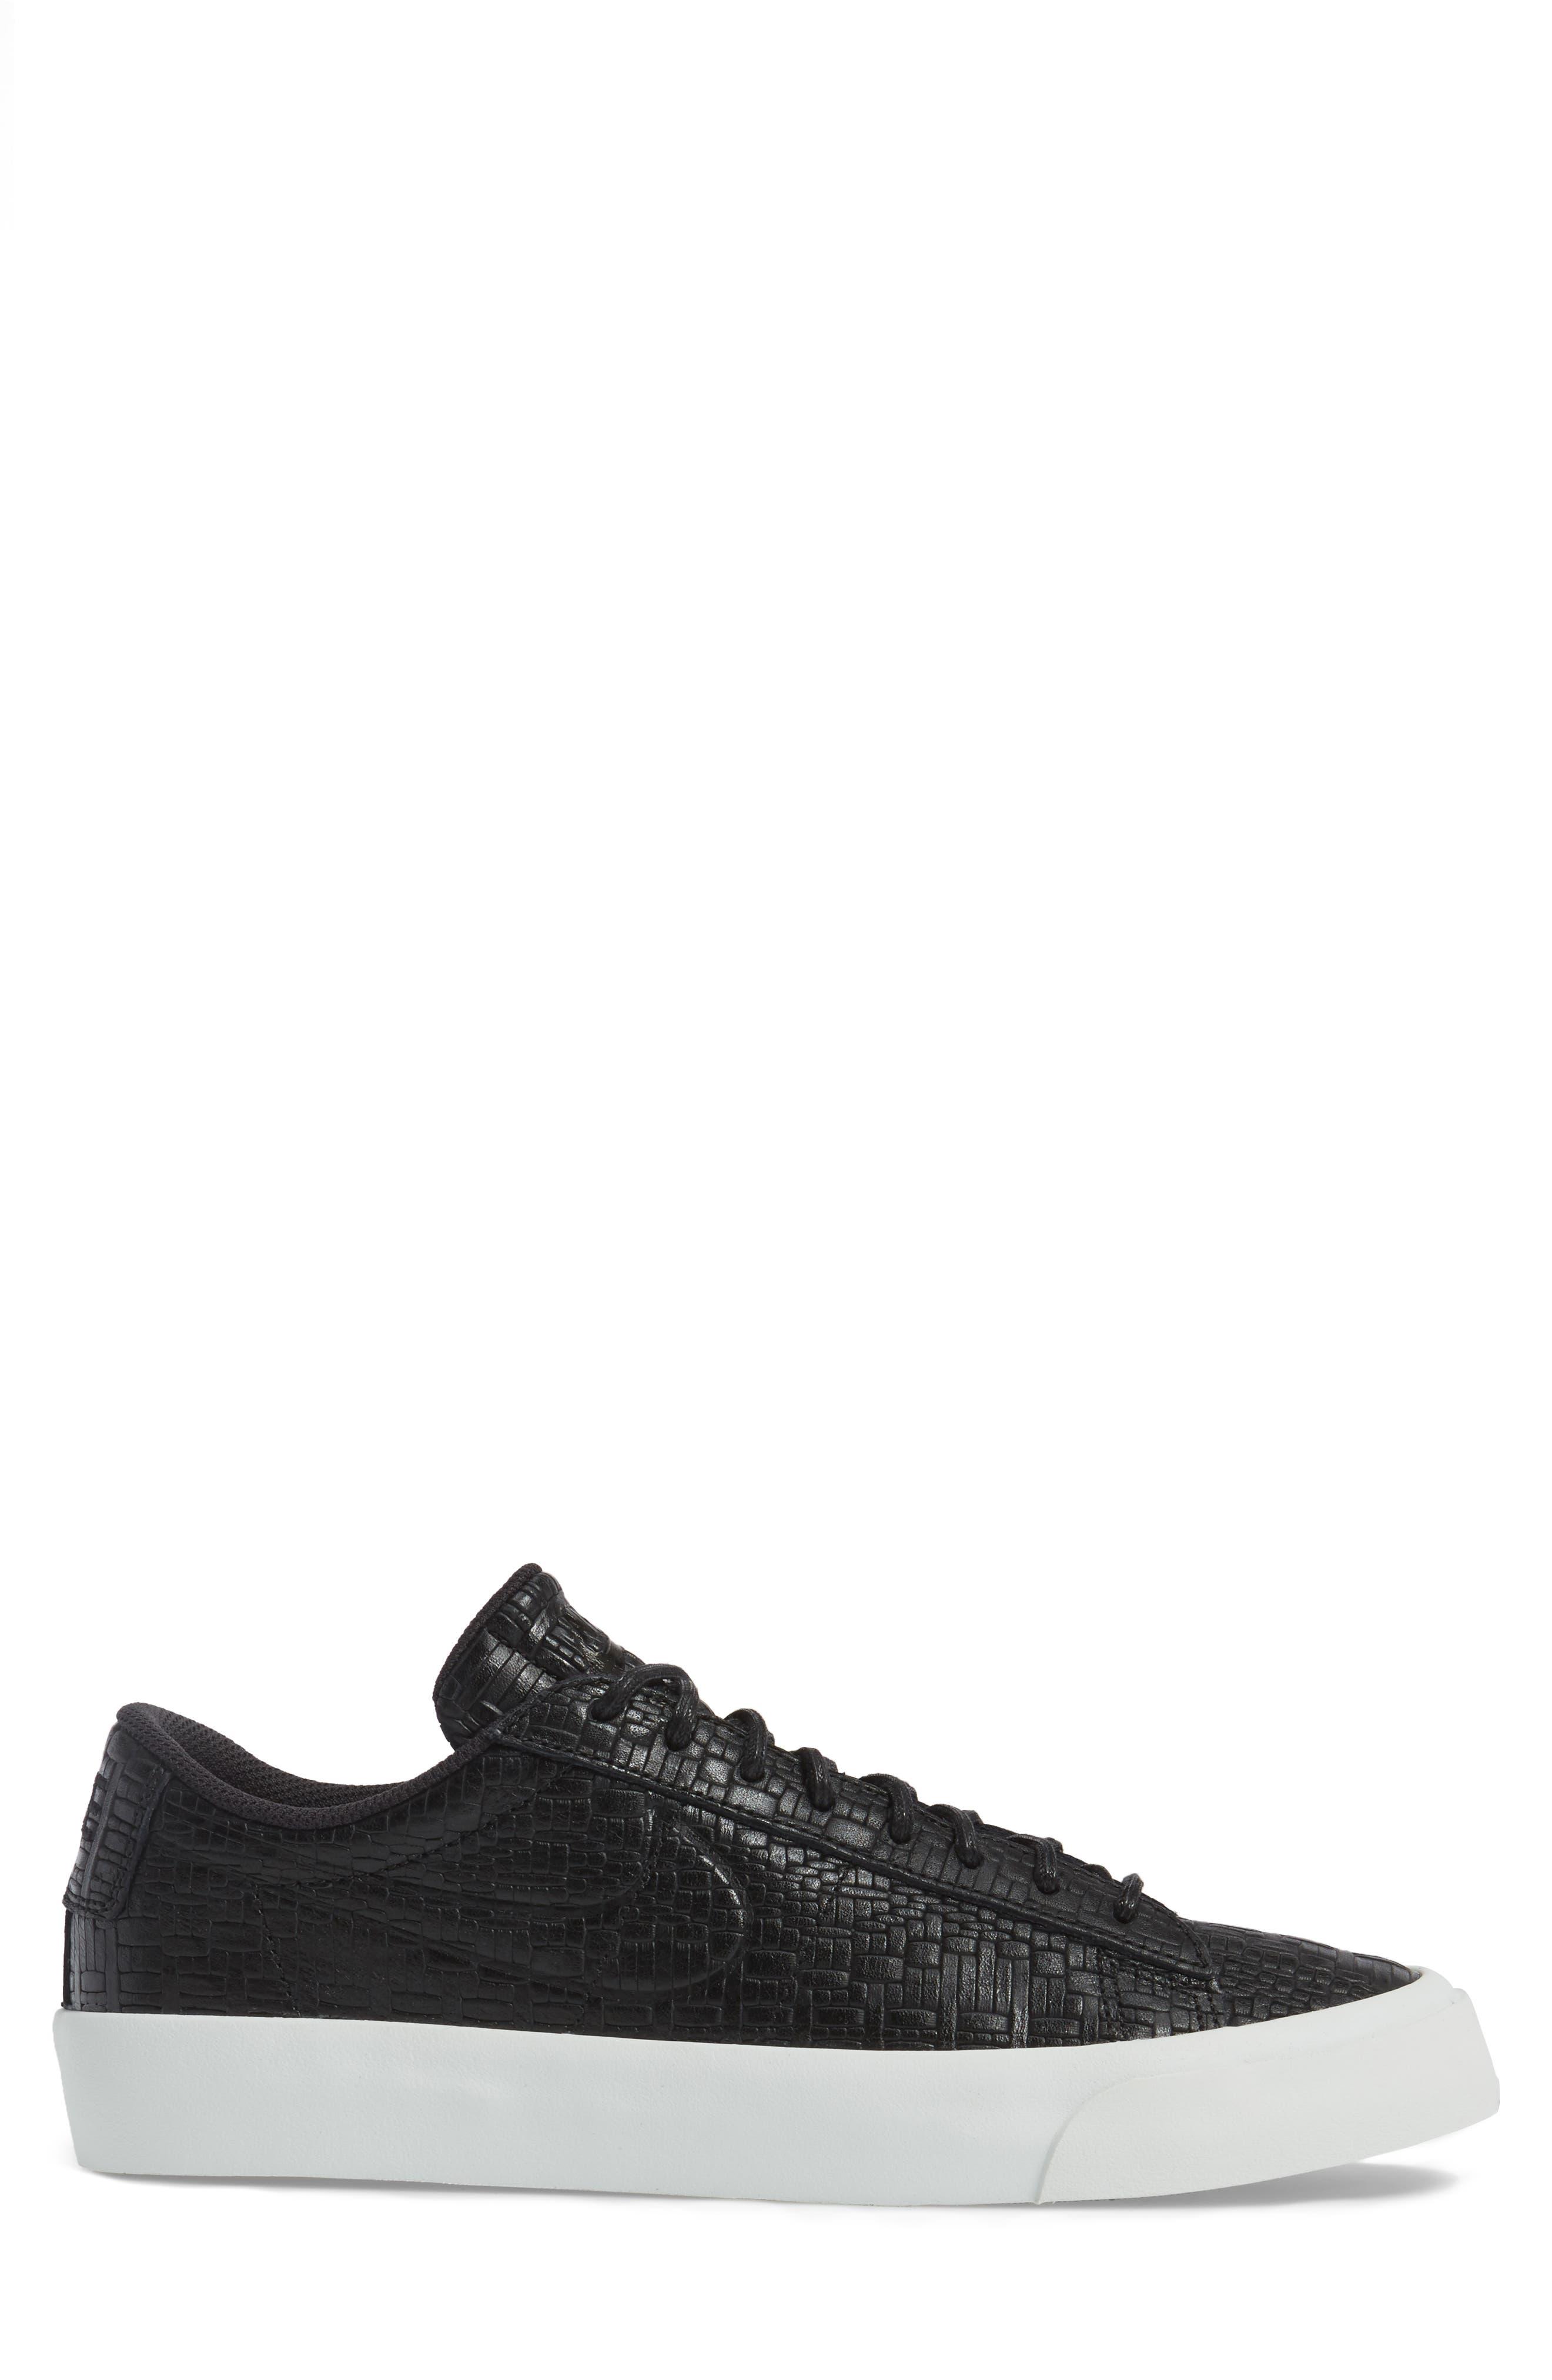 Blazer Studio Sneaker,                             Alternate thumbnail 3, color,                             001